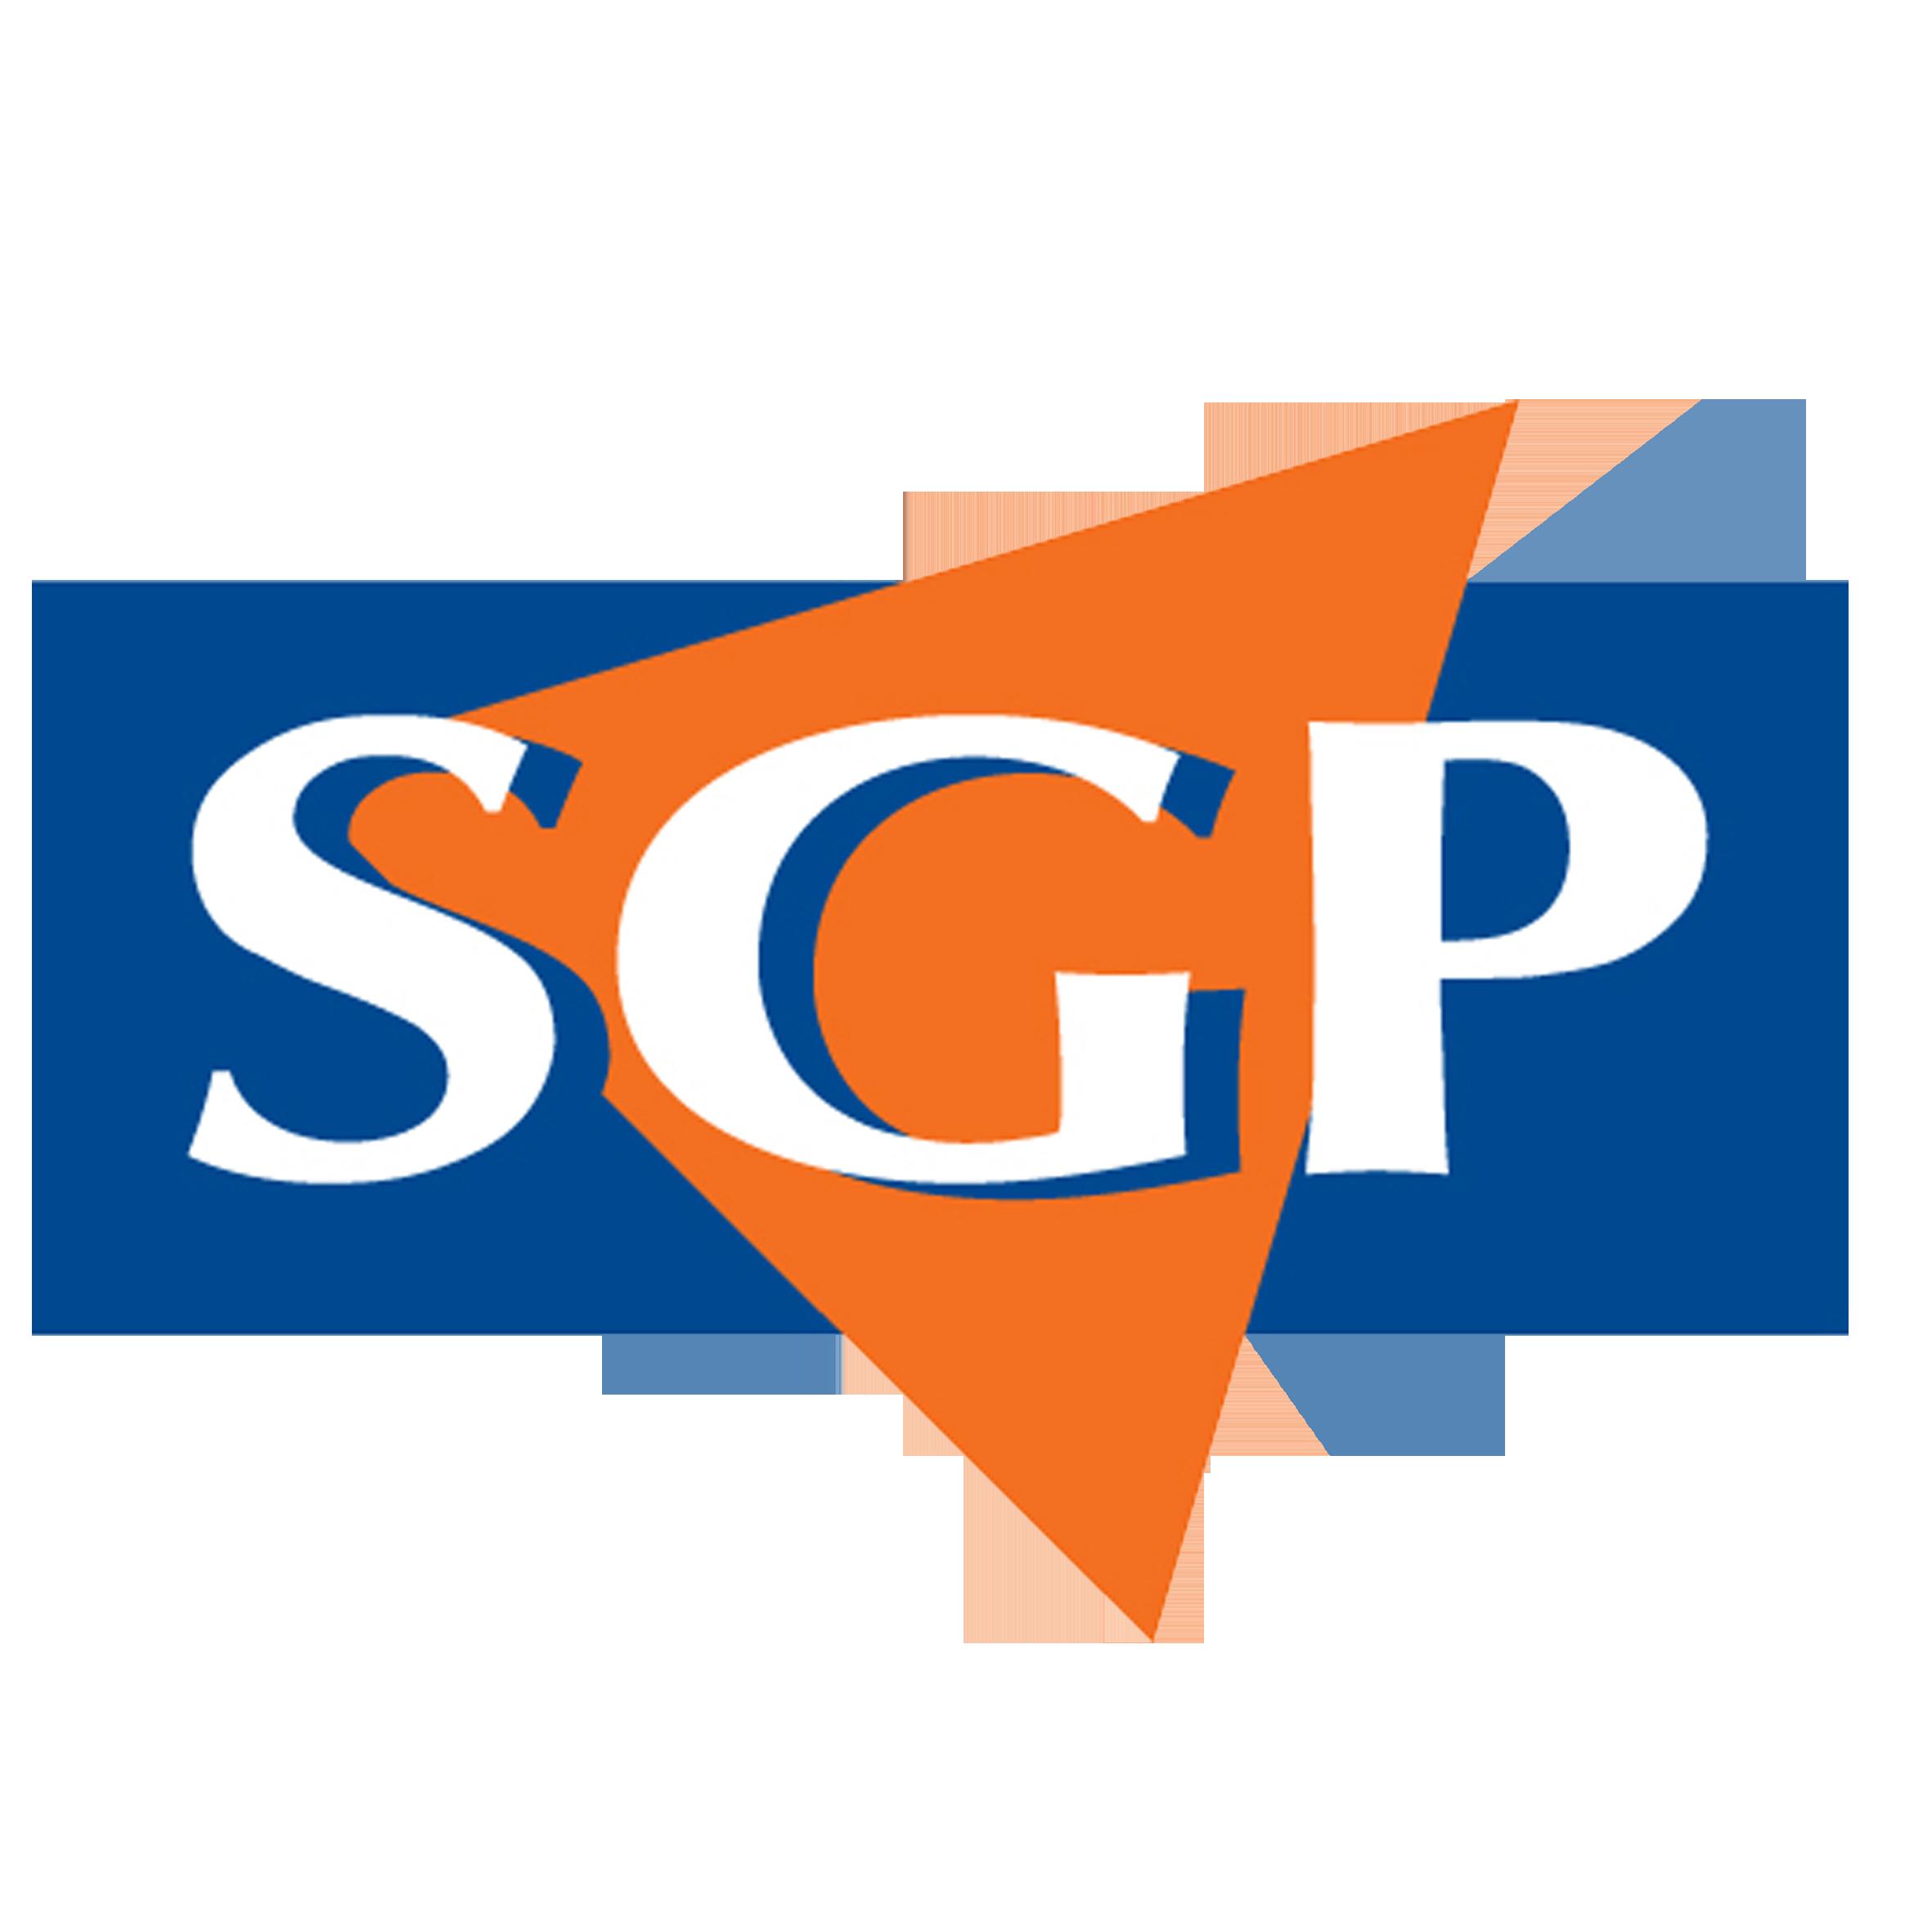 SGP Logo Wallpaper